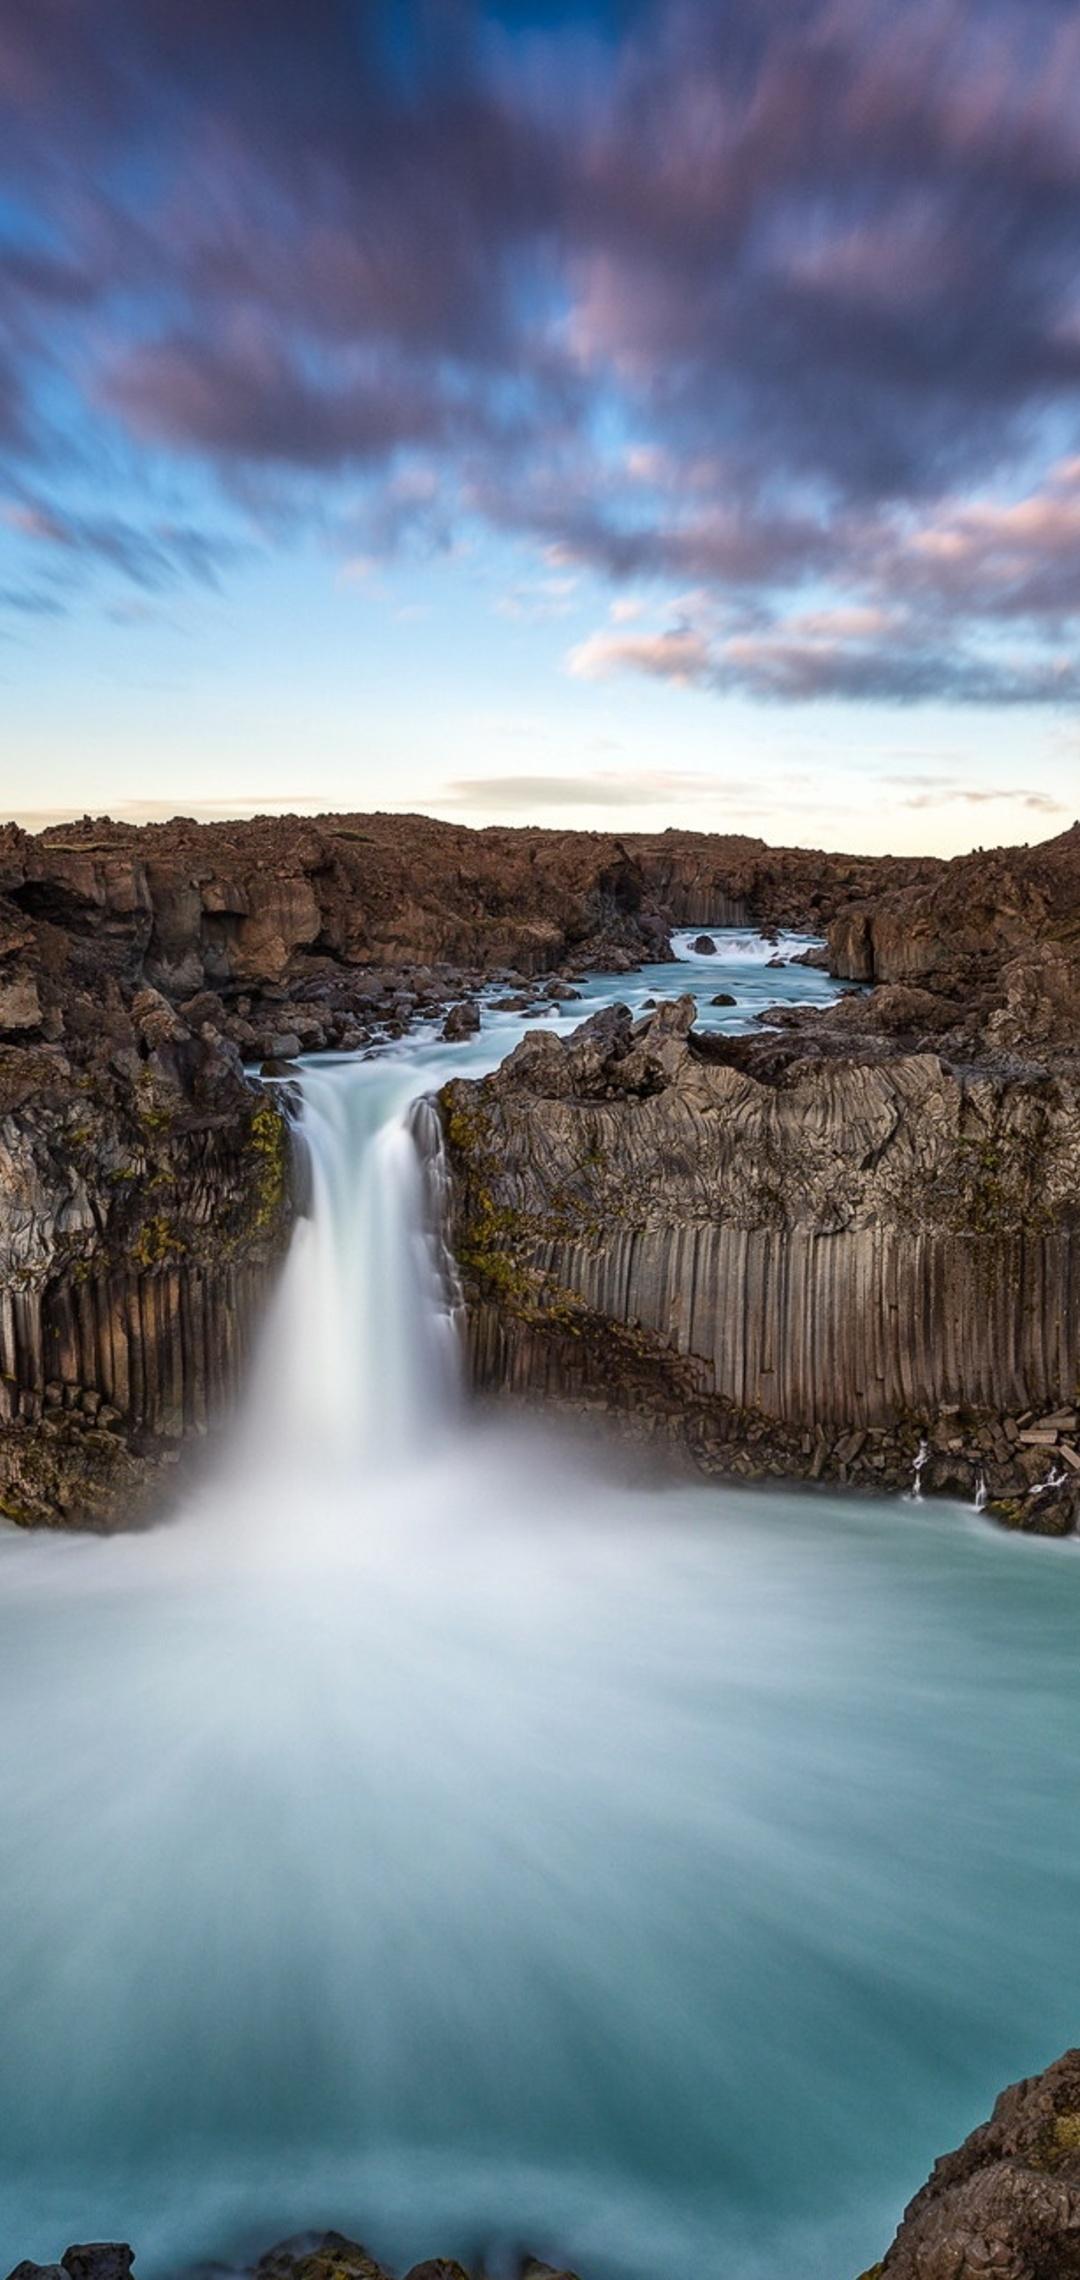 waterfall-hd-pq.jpg